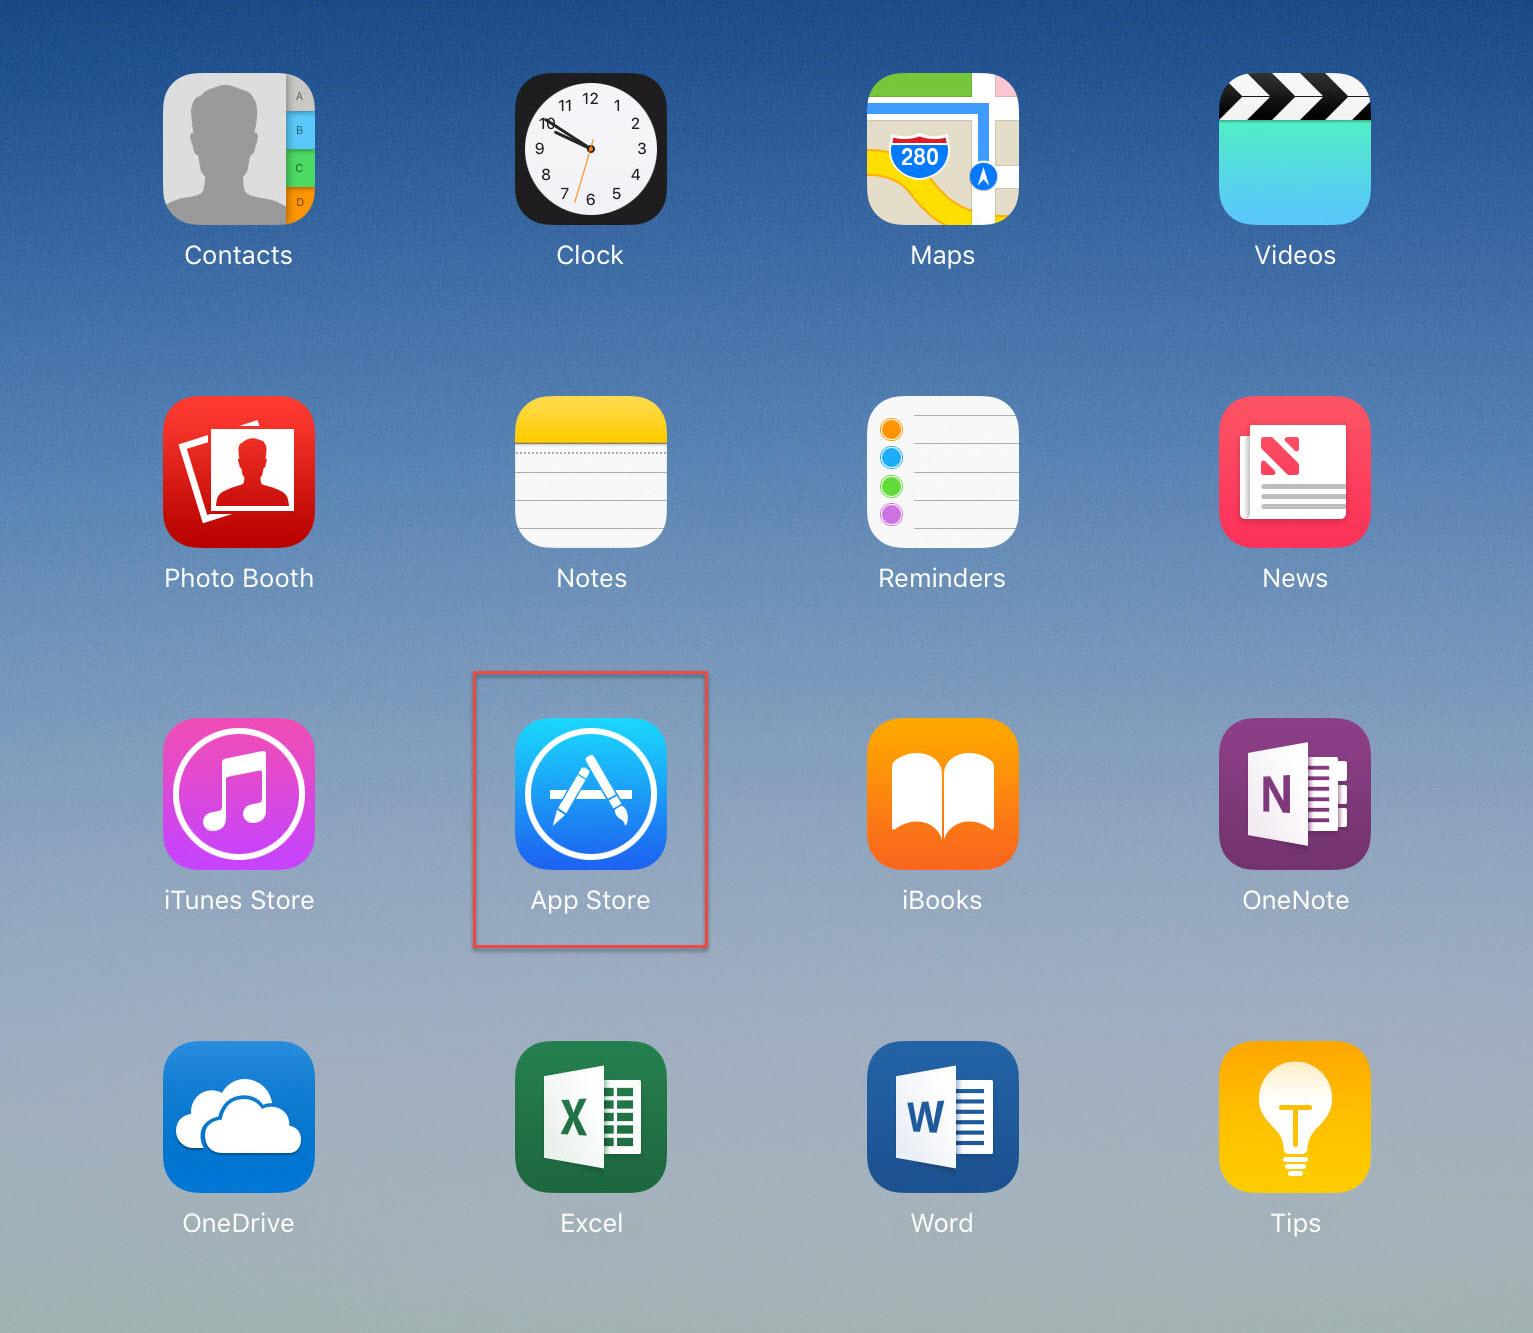 Downloading Blackboard Mobile Learn App on iPad or iPhone - Ferris on ios store, windows 8 store, map search, google store, map google, map app talk, iphone store, map my walk app, map bing, map weather, map design, map pins app,